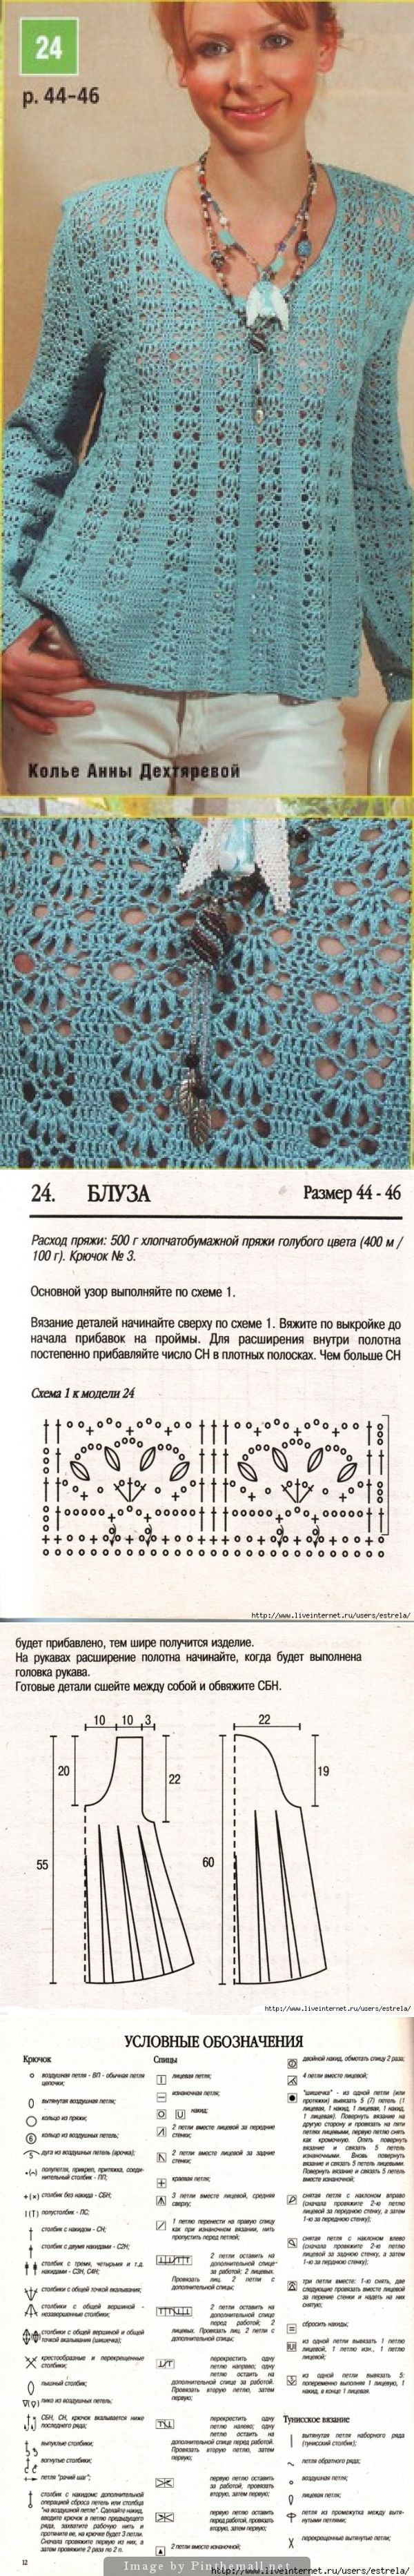 Crochet pullover - http://www.liveinternet.ru/users/4127920/post242359557/ - created via http://pinthemall.net